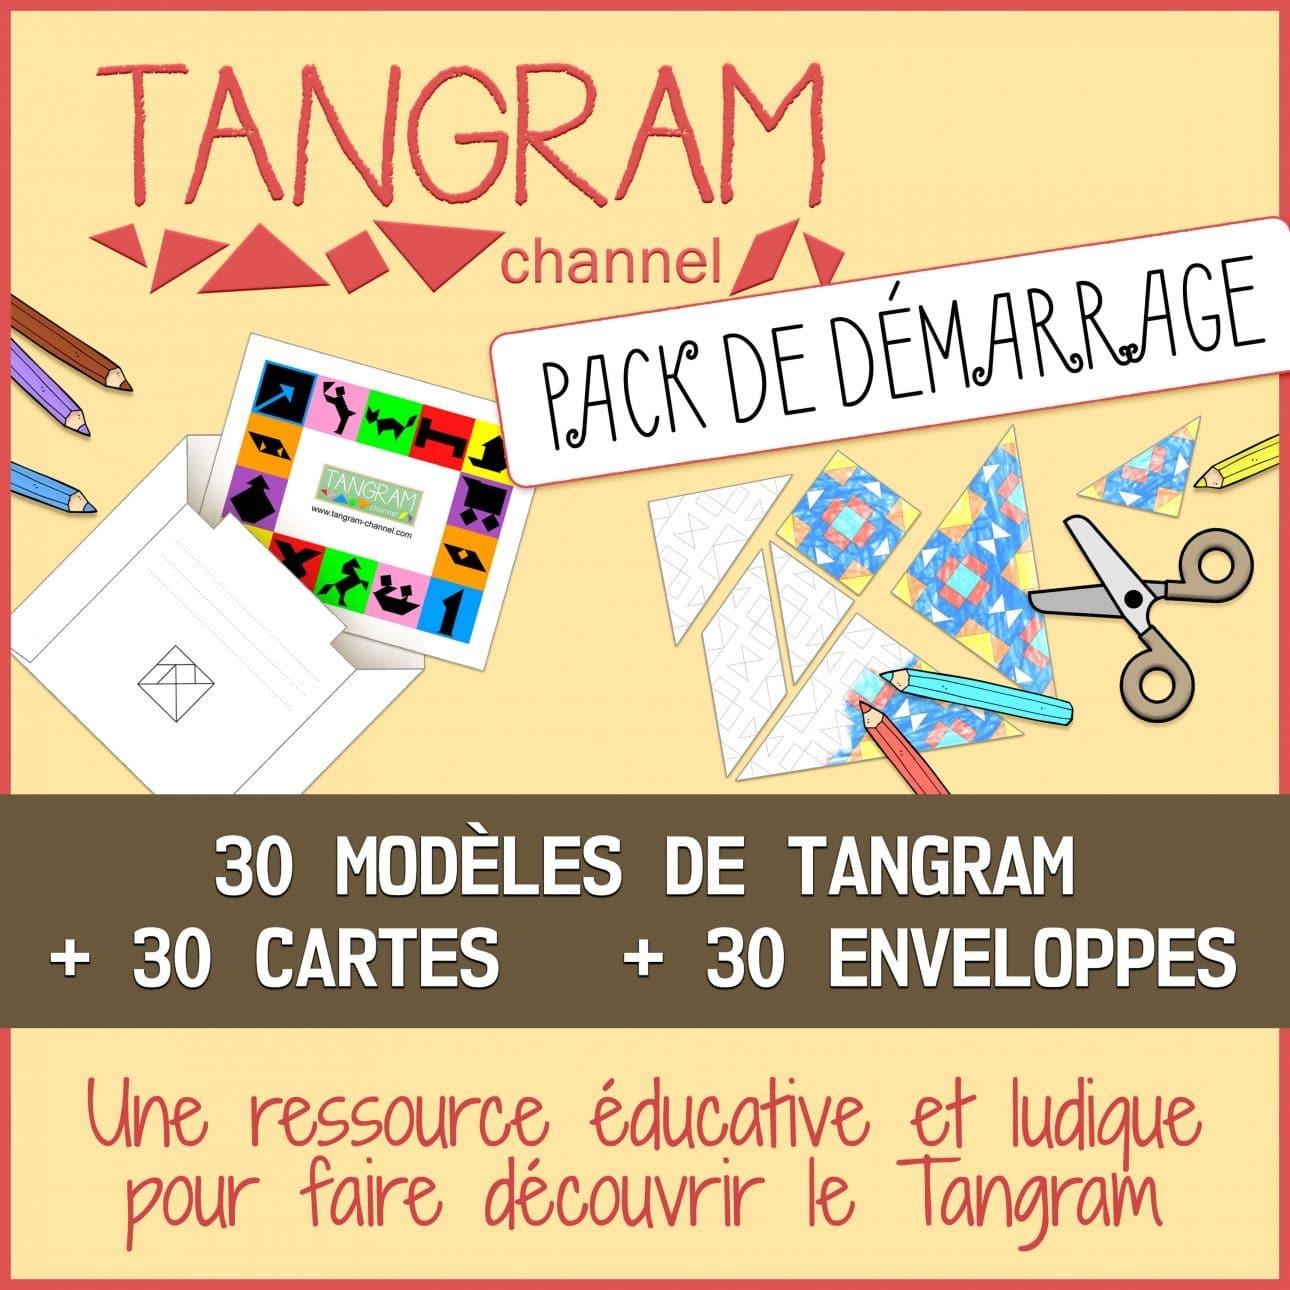 Tangram Channel – PACK DE DEMARRAGE